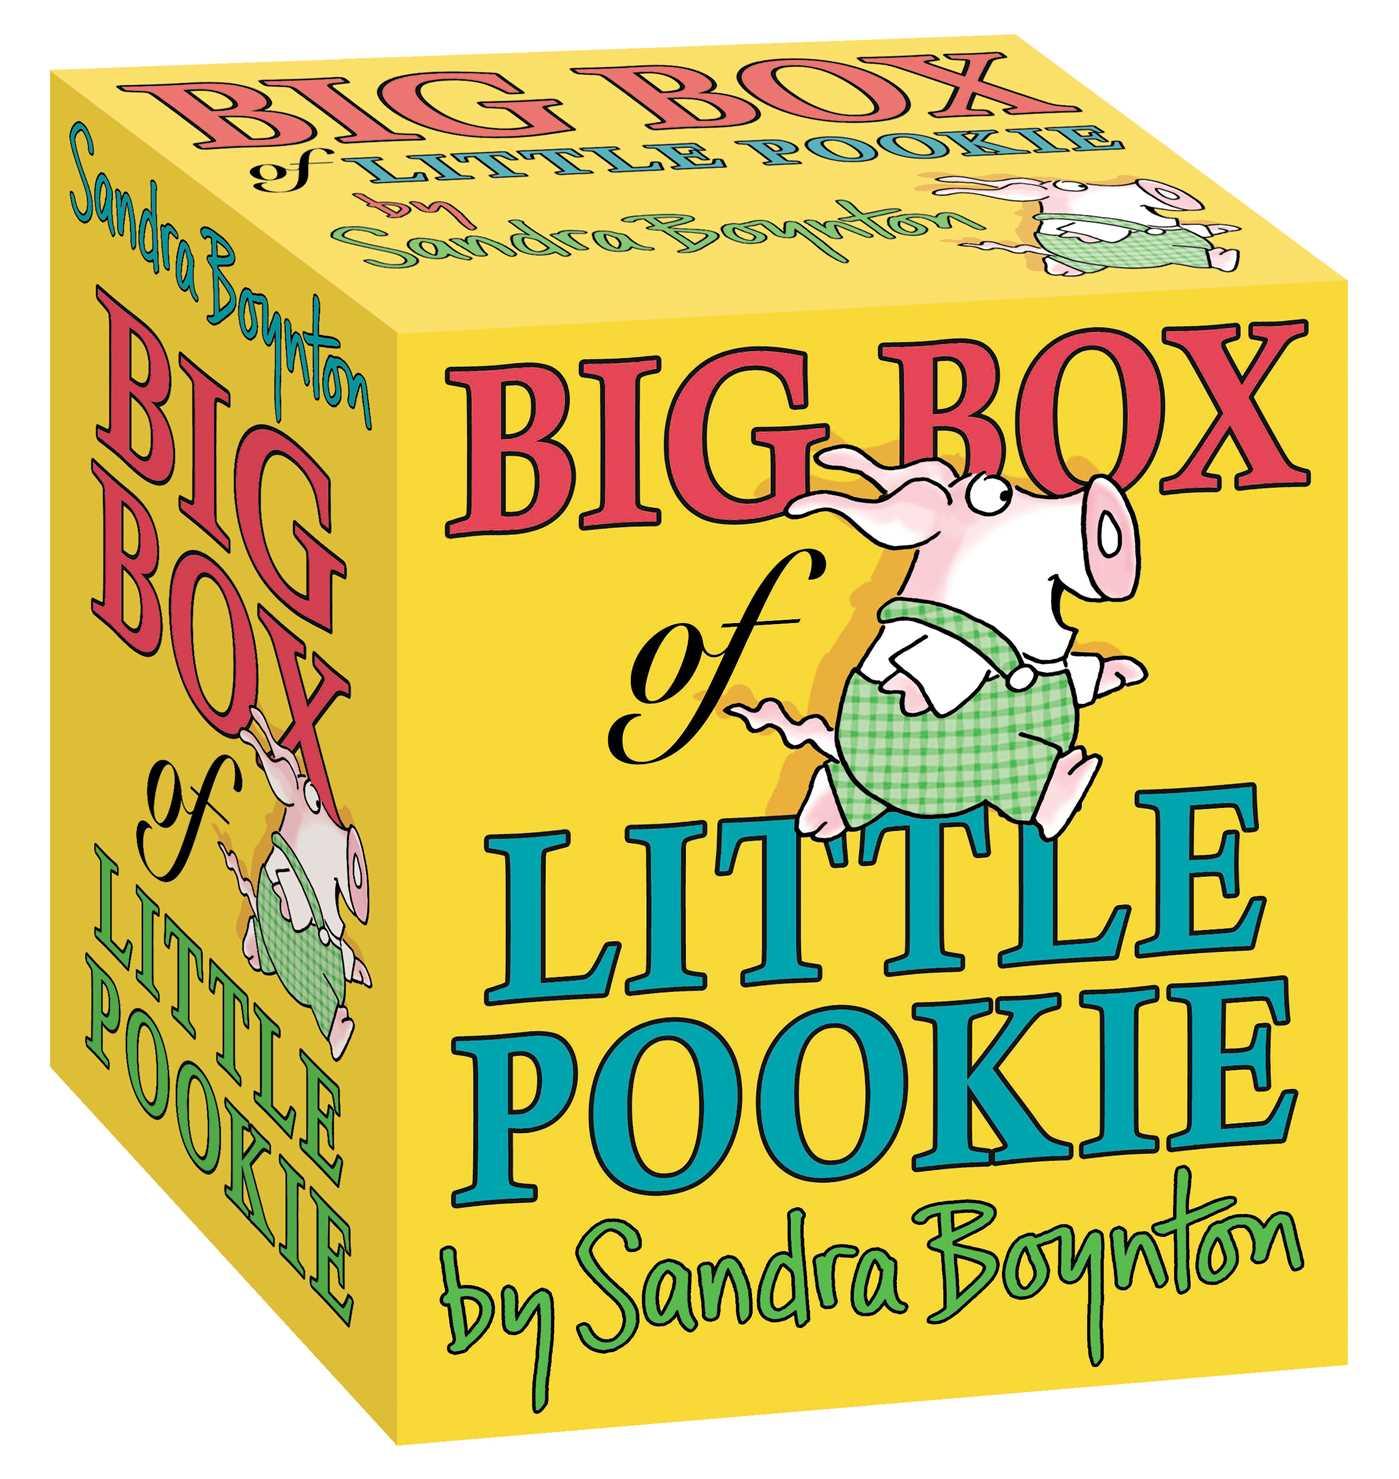 Big box of little pookie 9781534404779 hr